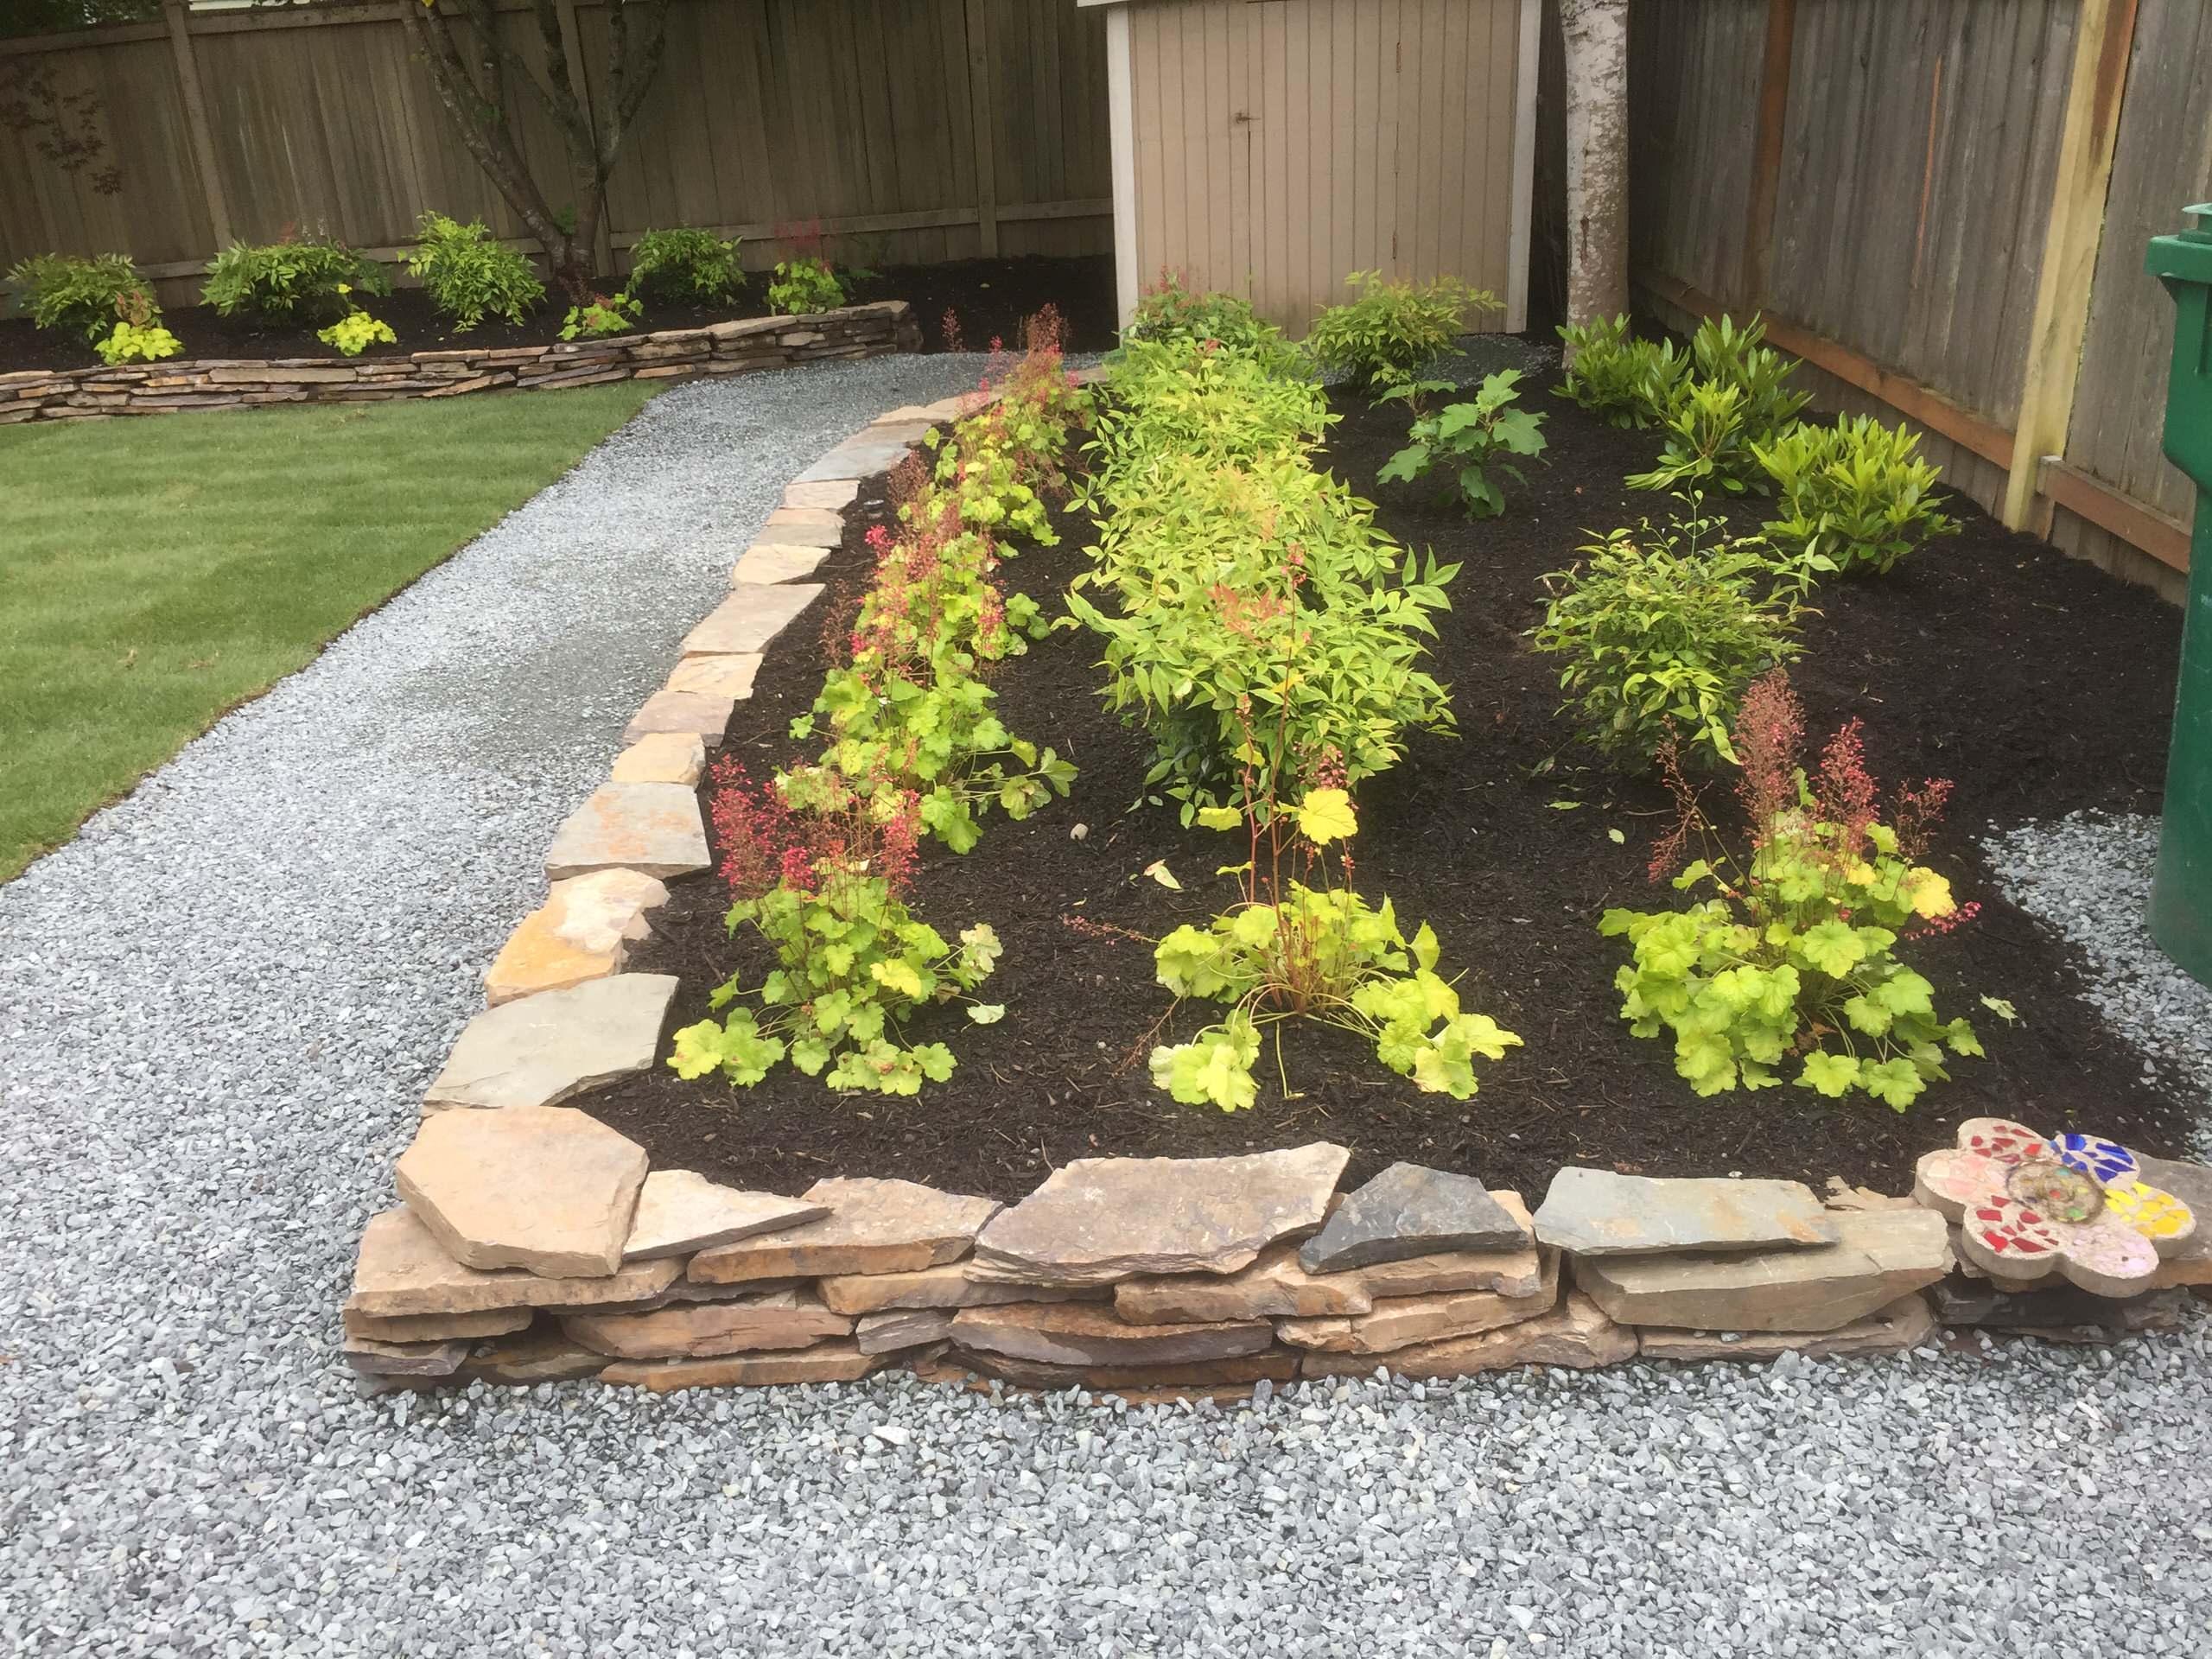 Yard Renovation - Raised Plant Bed